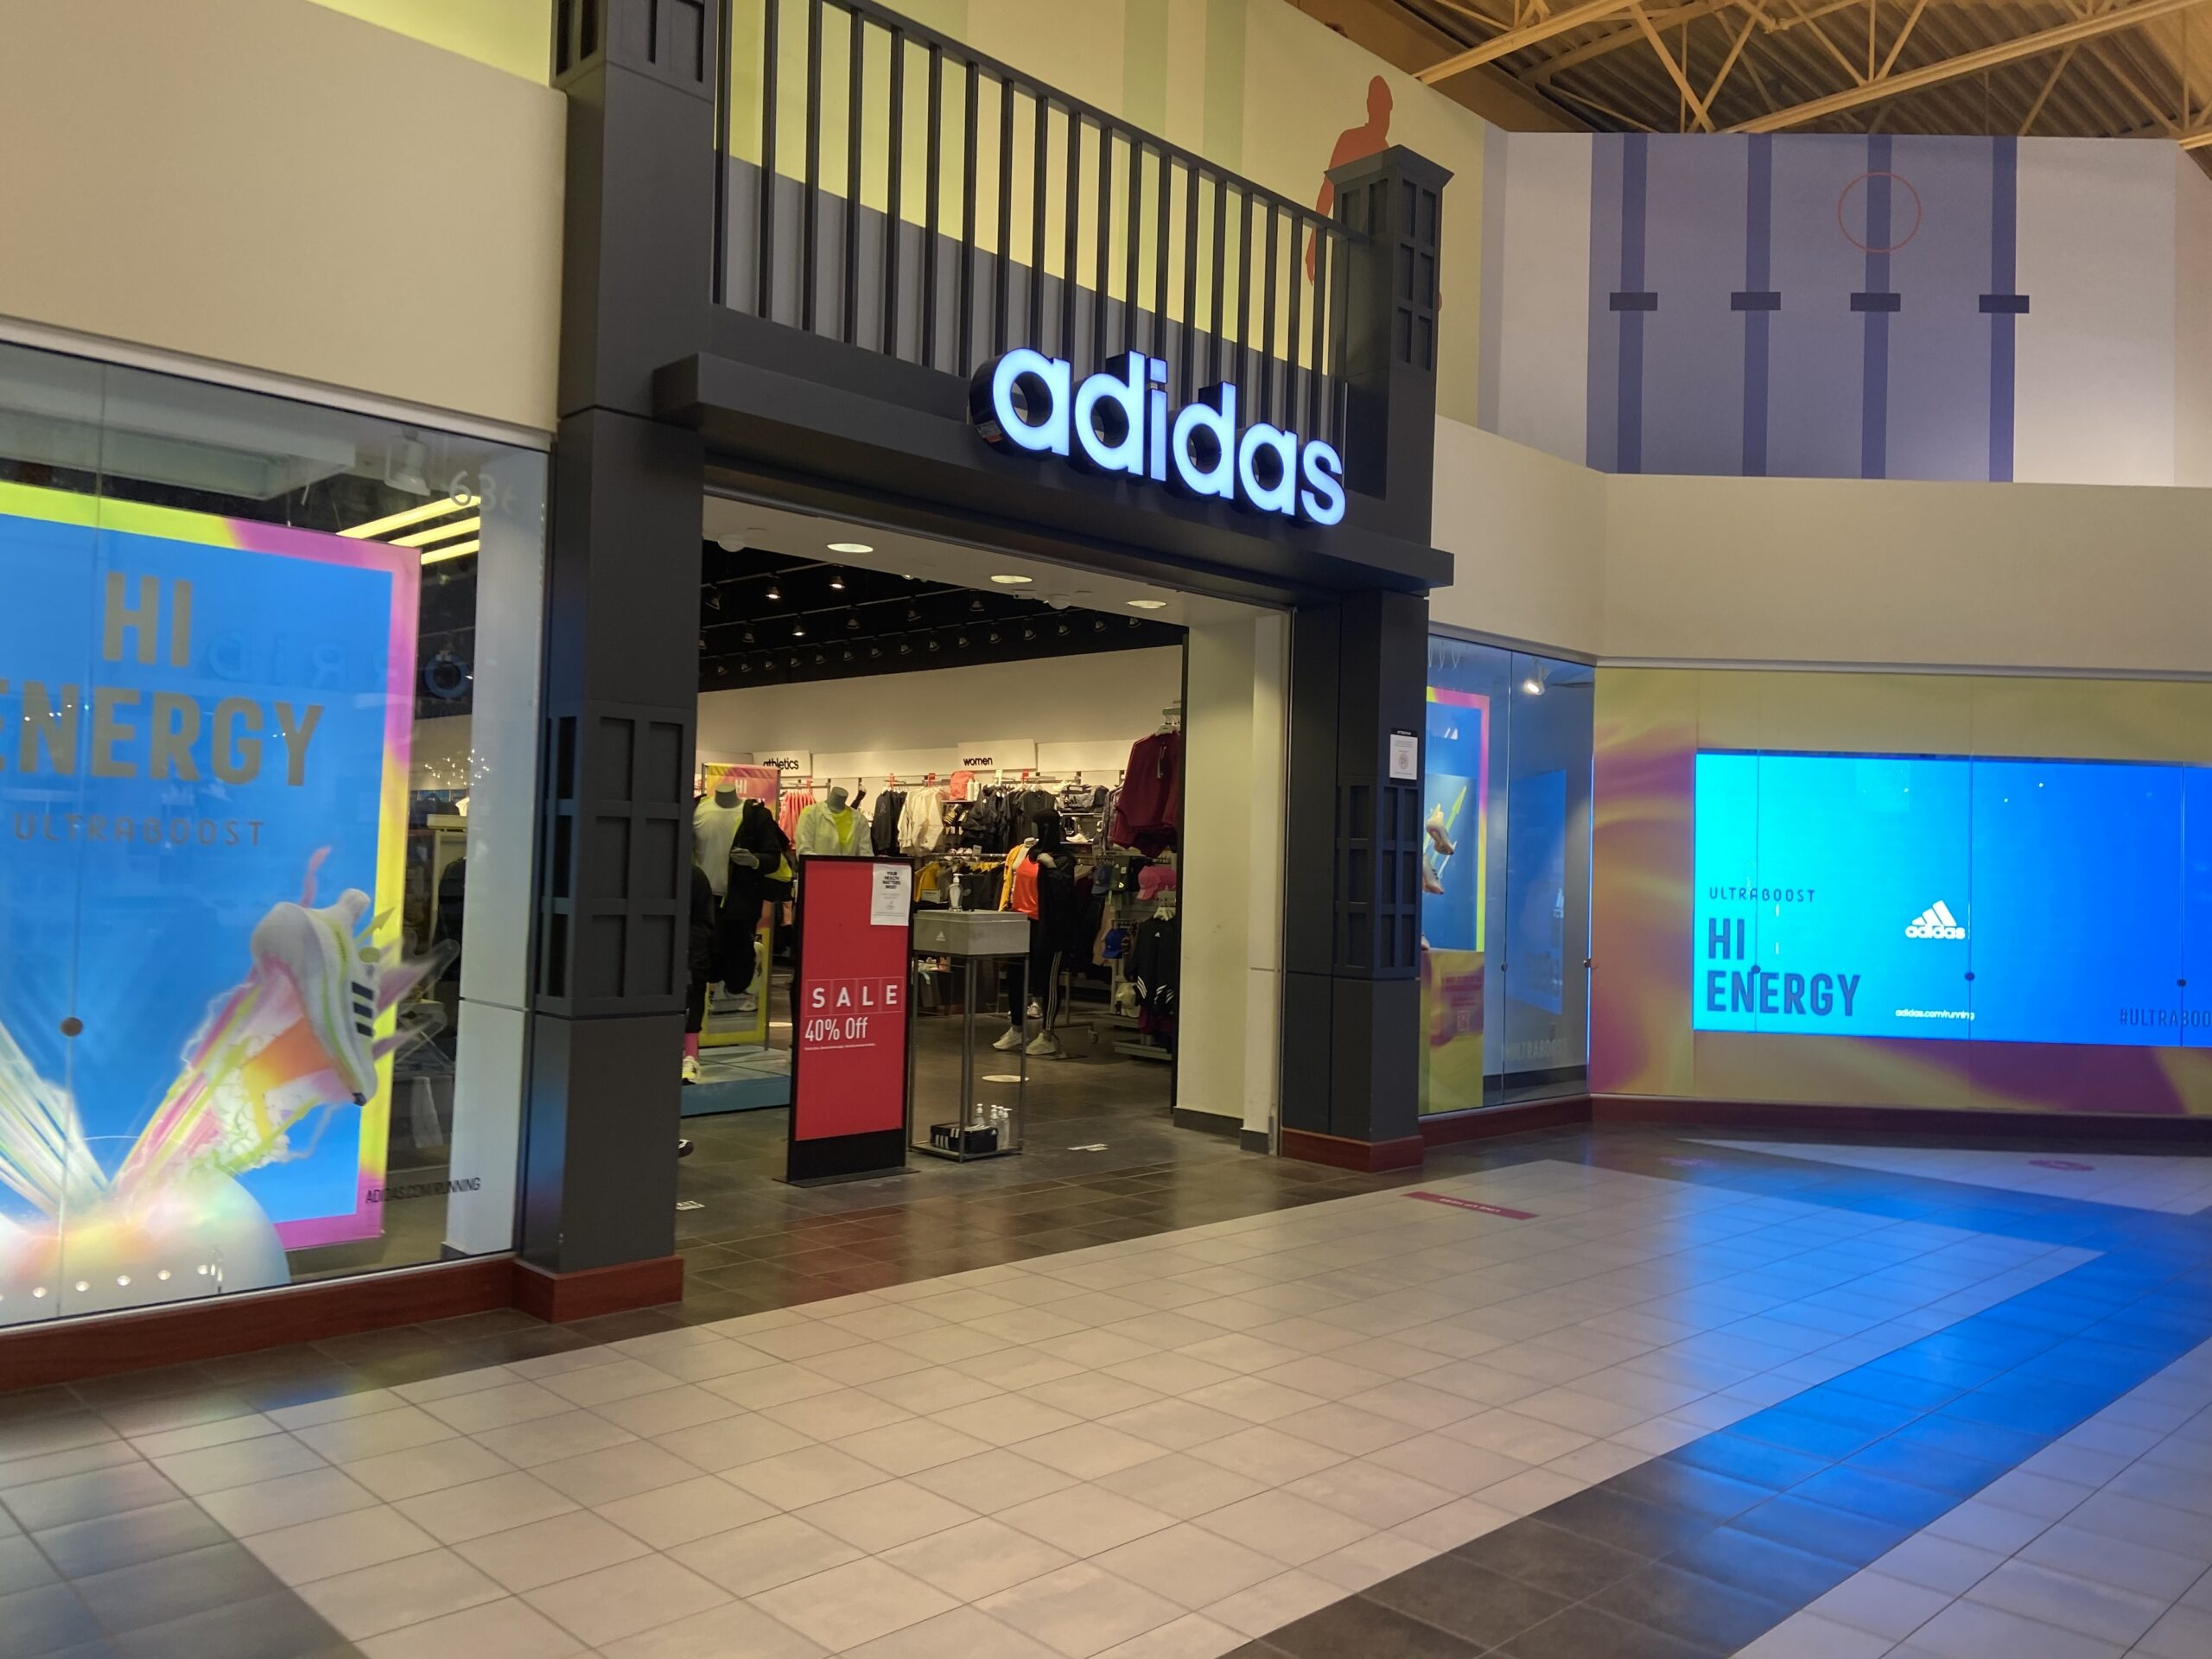 Adidas at CrossIron Mills